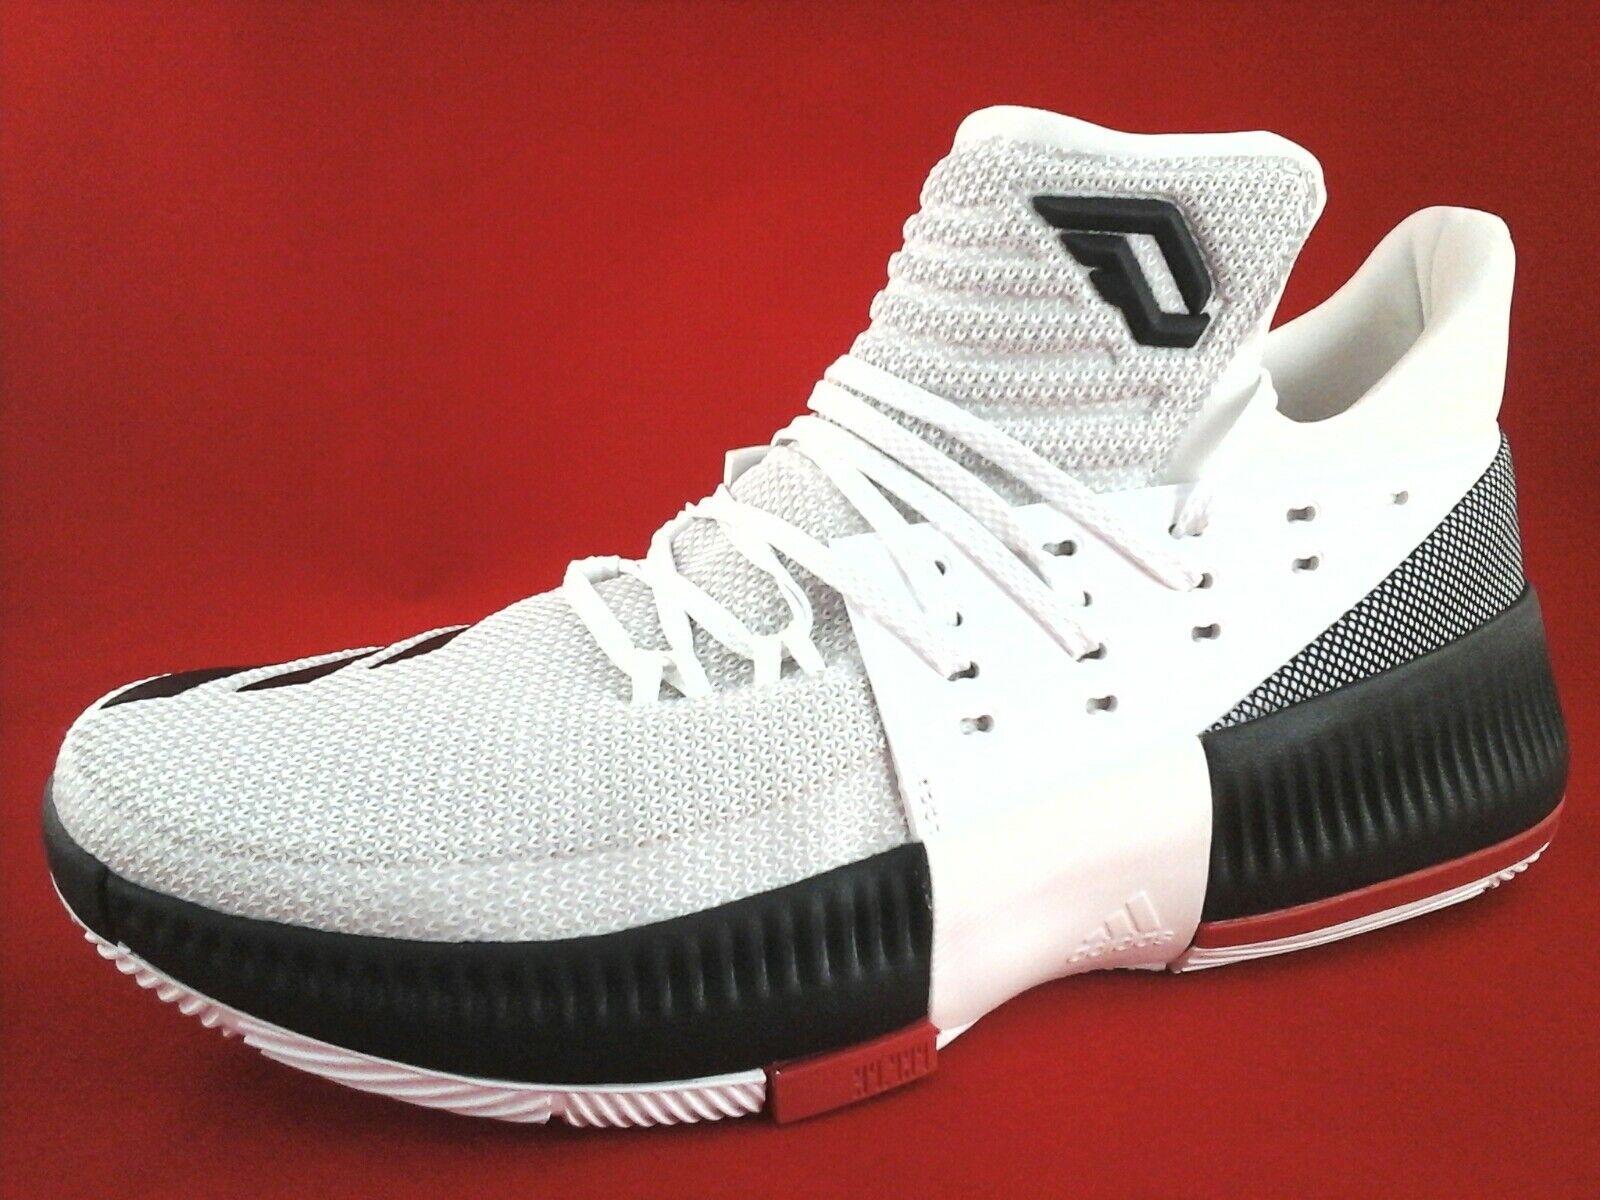 huge discount a80d8 3b481 Adidas Damian Lillard Dame 3 WBR BB8268 Basketball NBA Shoes US 10 EU 44 New